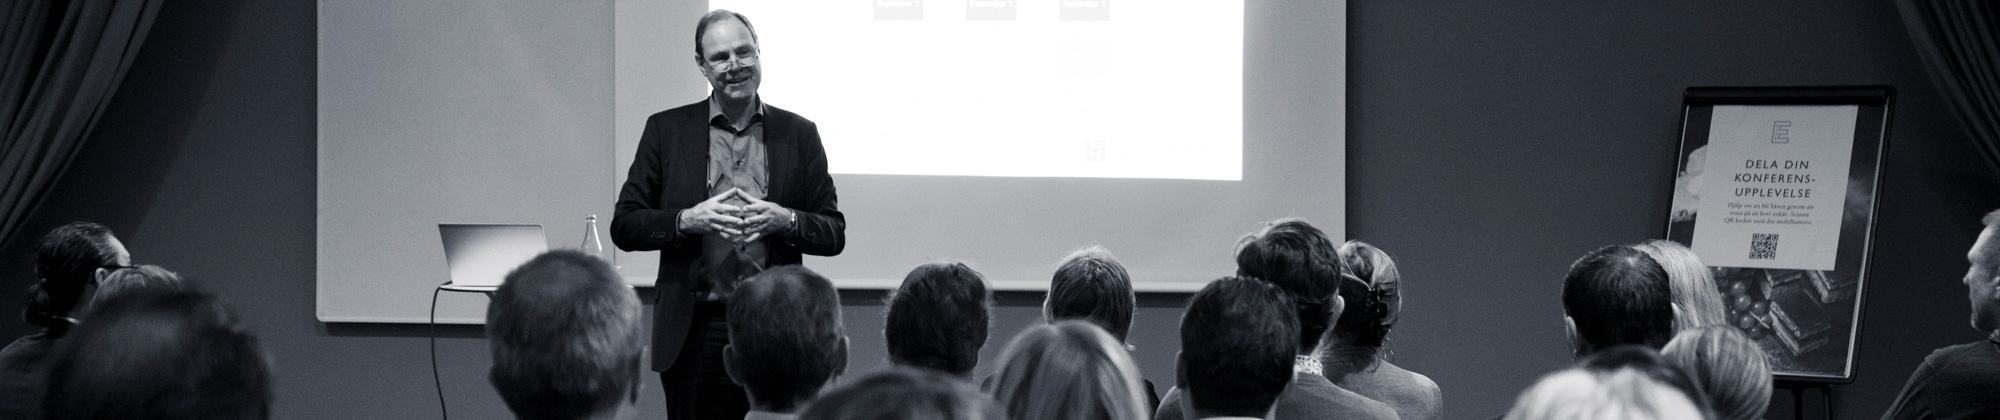 Talare Michael Magnoff i december 2019